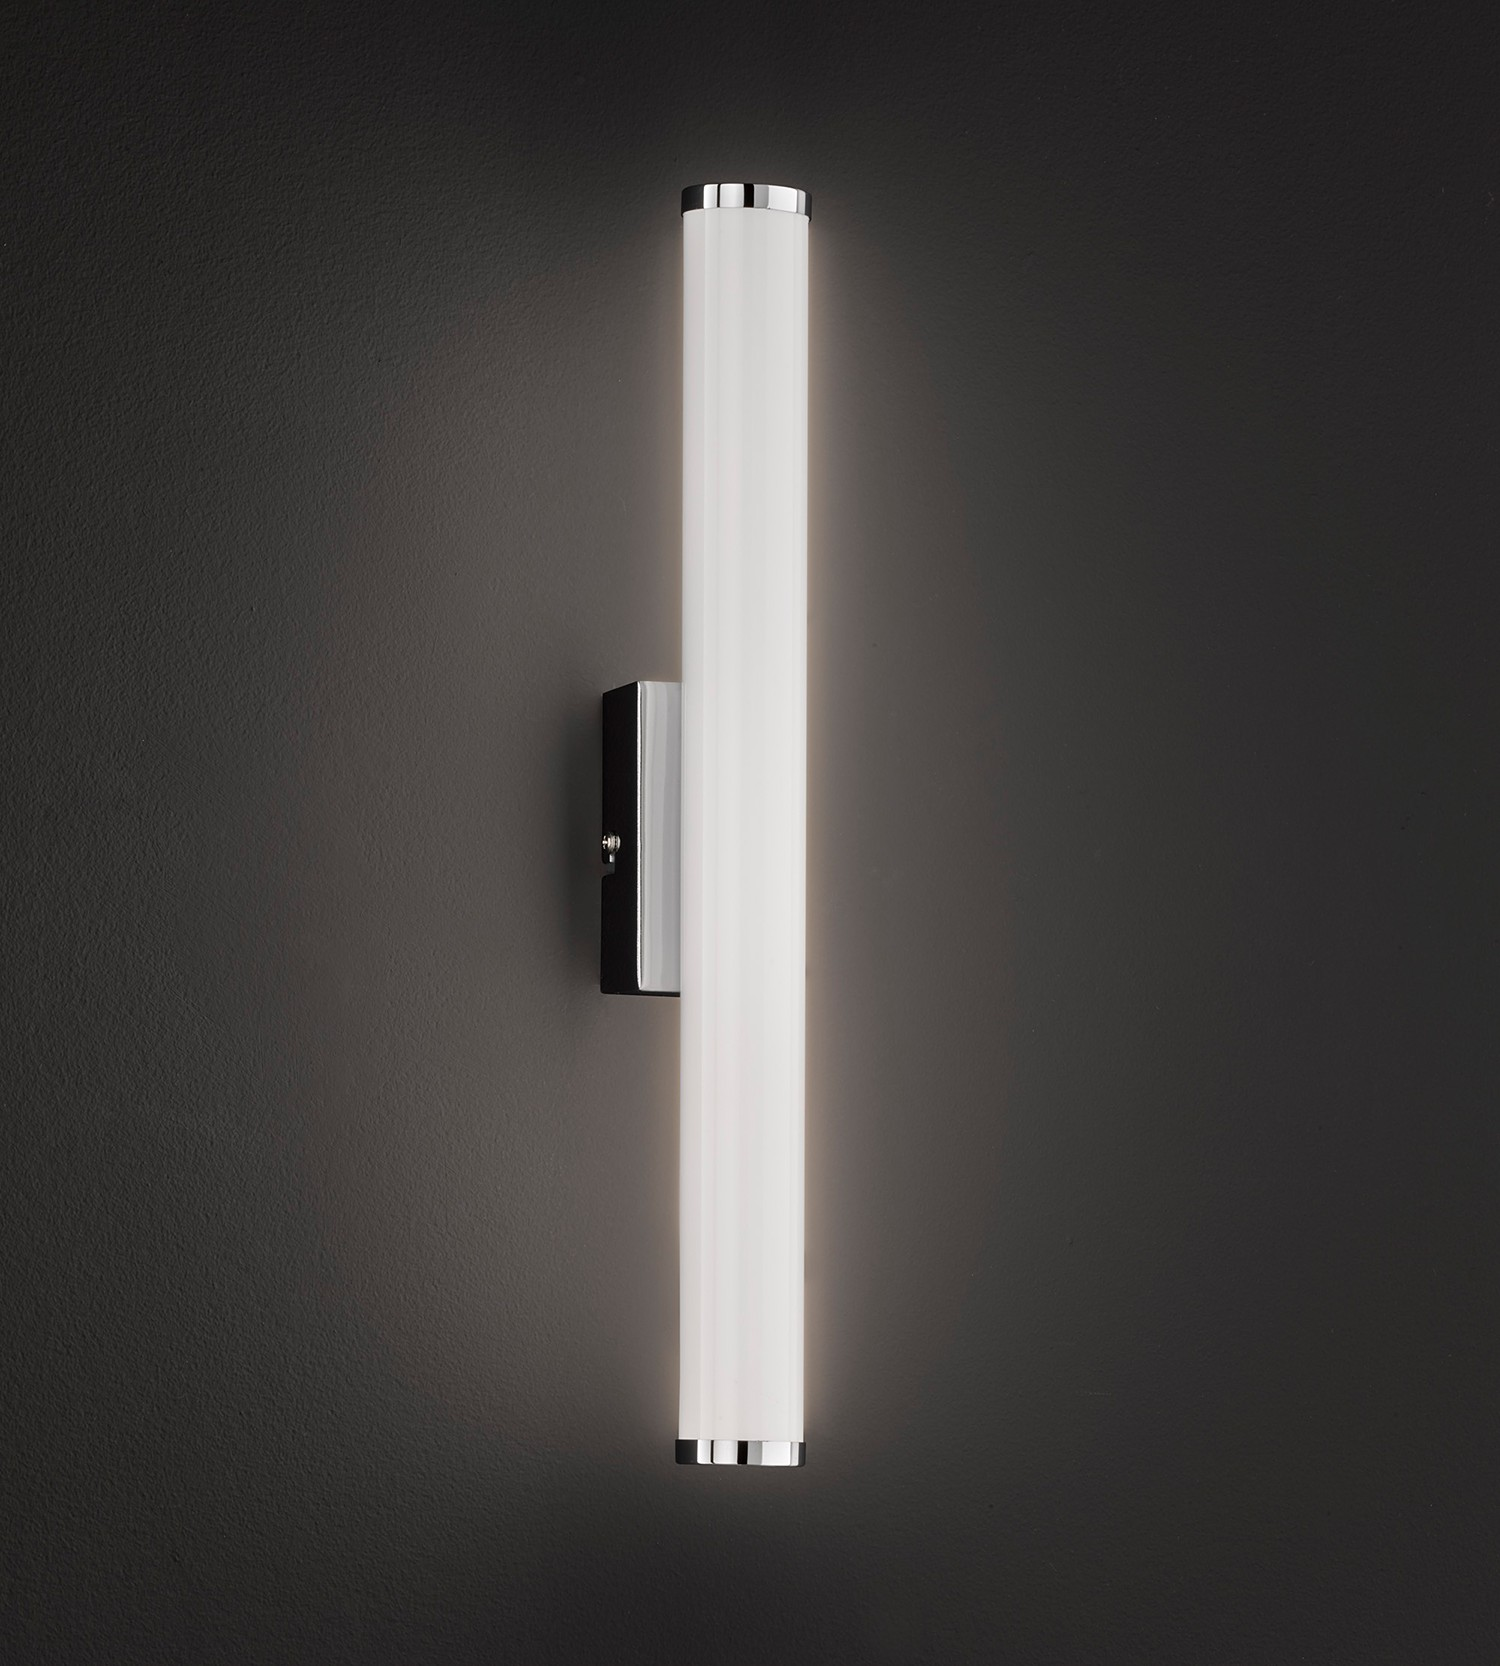 LED-Badleuchte Ann I, Wofi